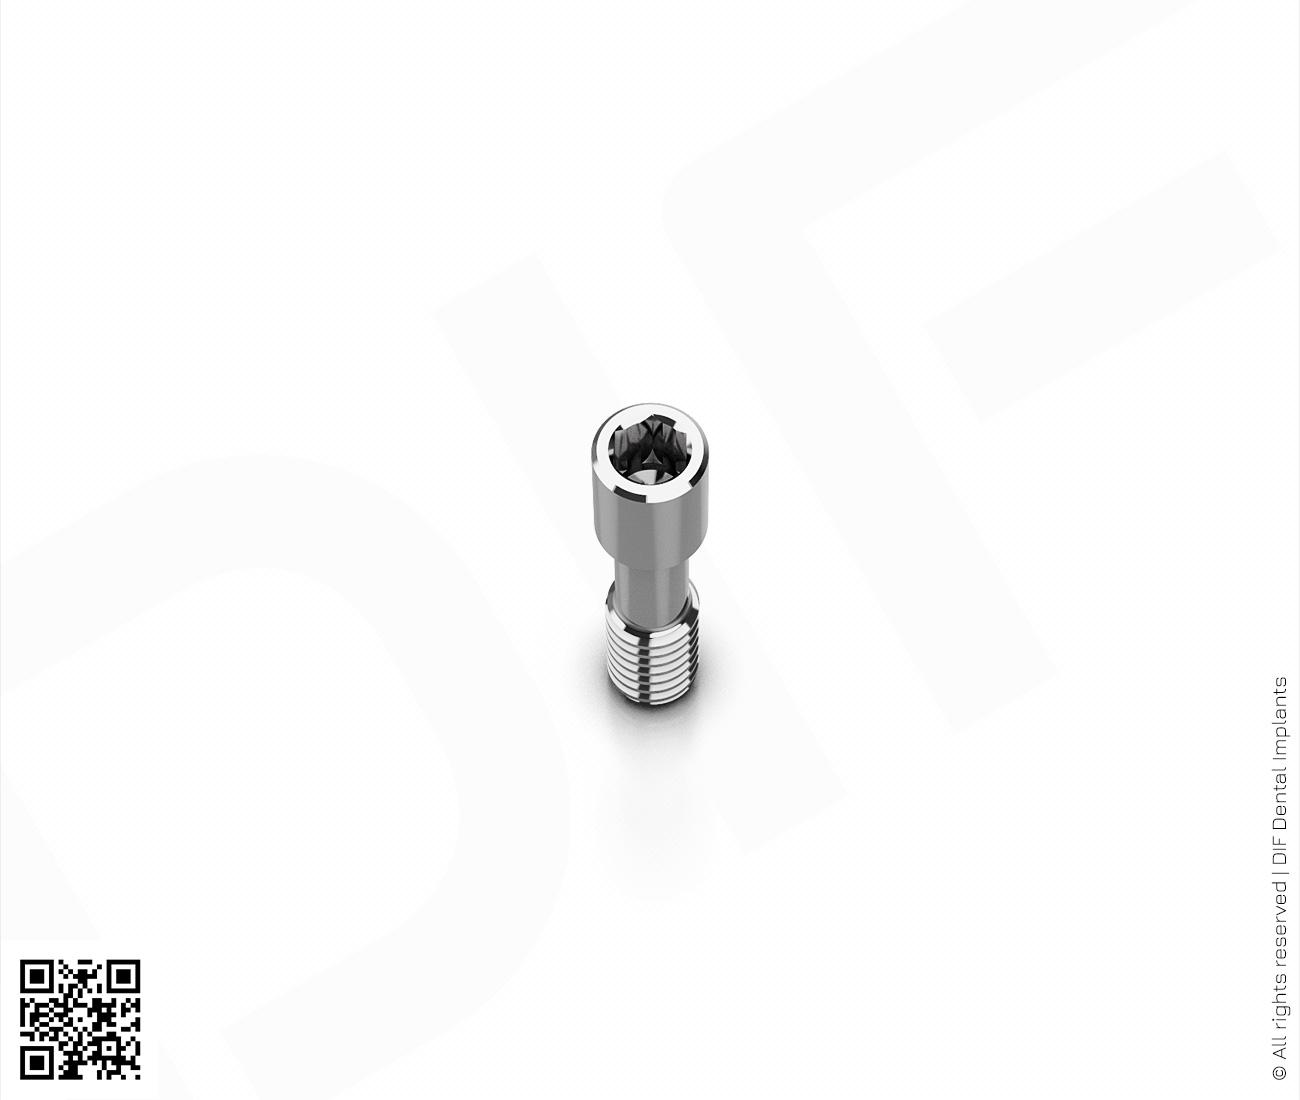 Фото винт титановый для абатмента d1.7 мм – h8.3 мм серии classic  производства DIF.